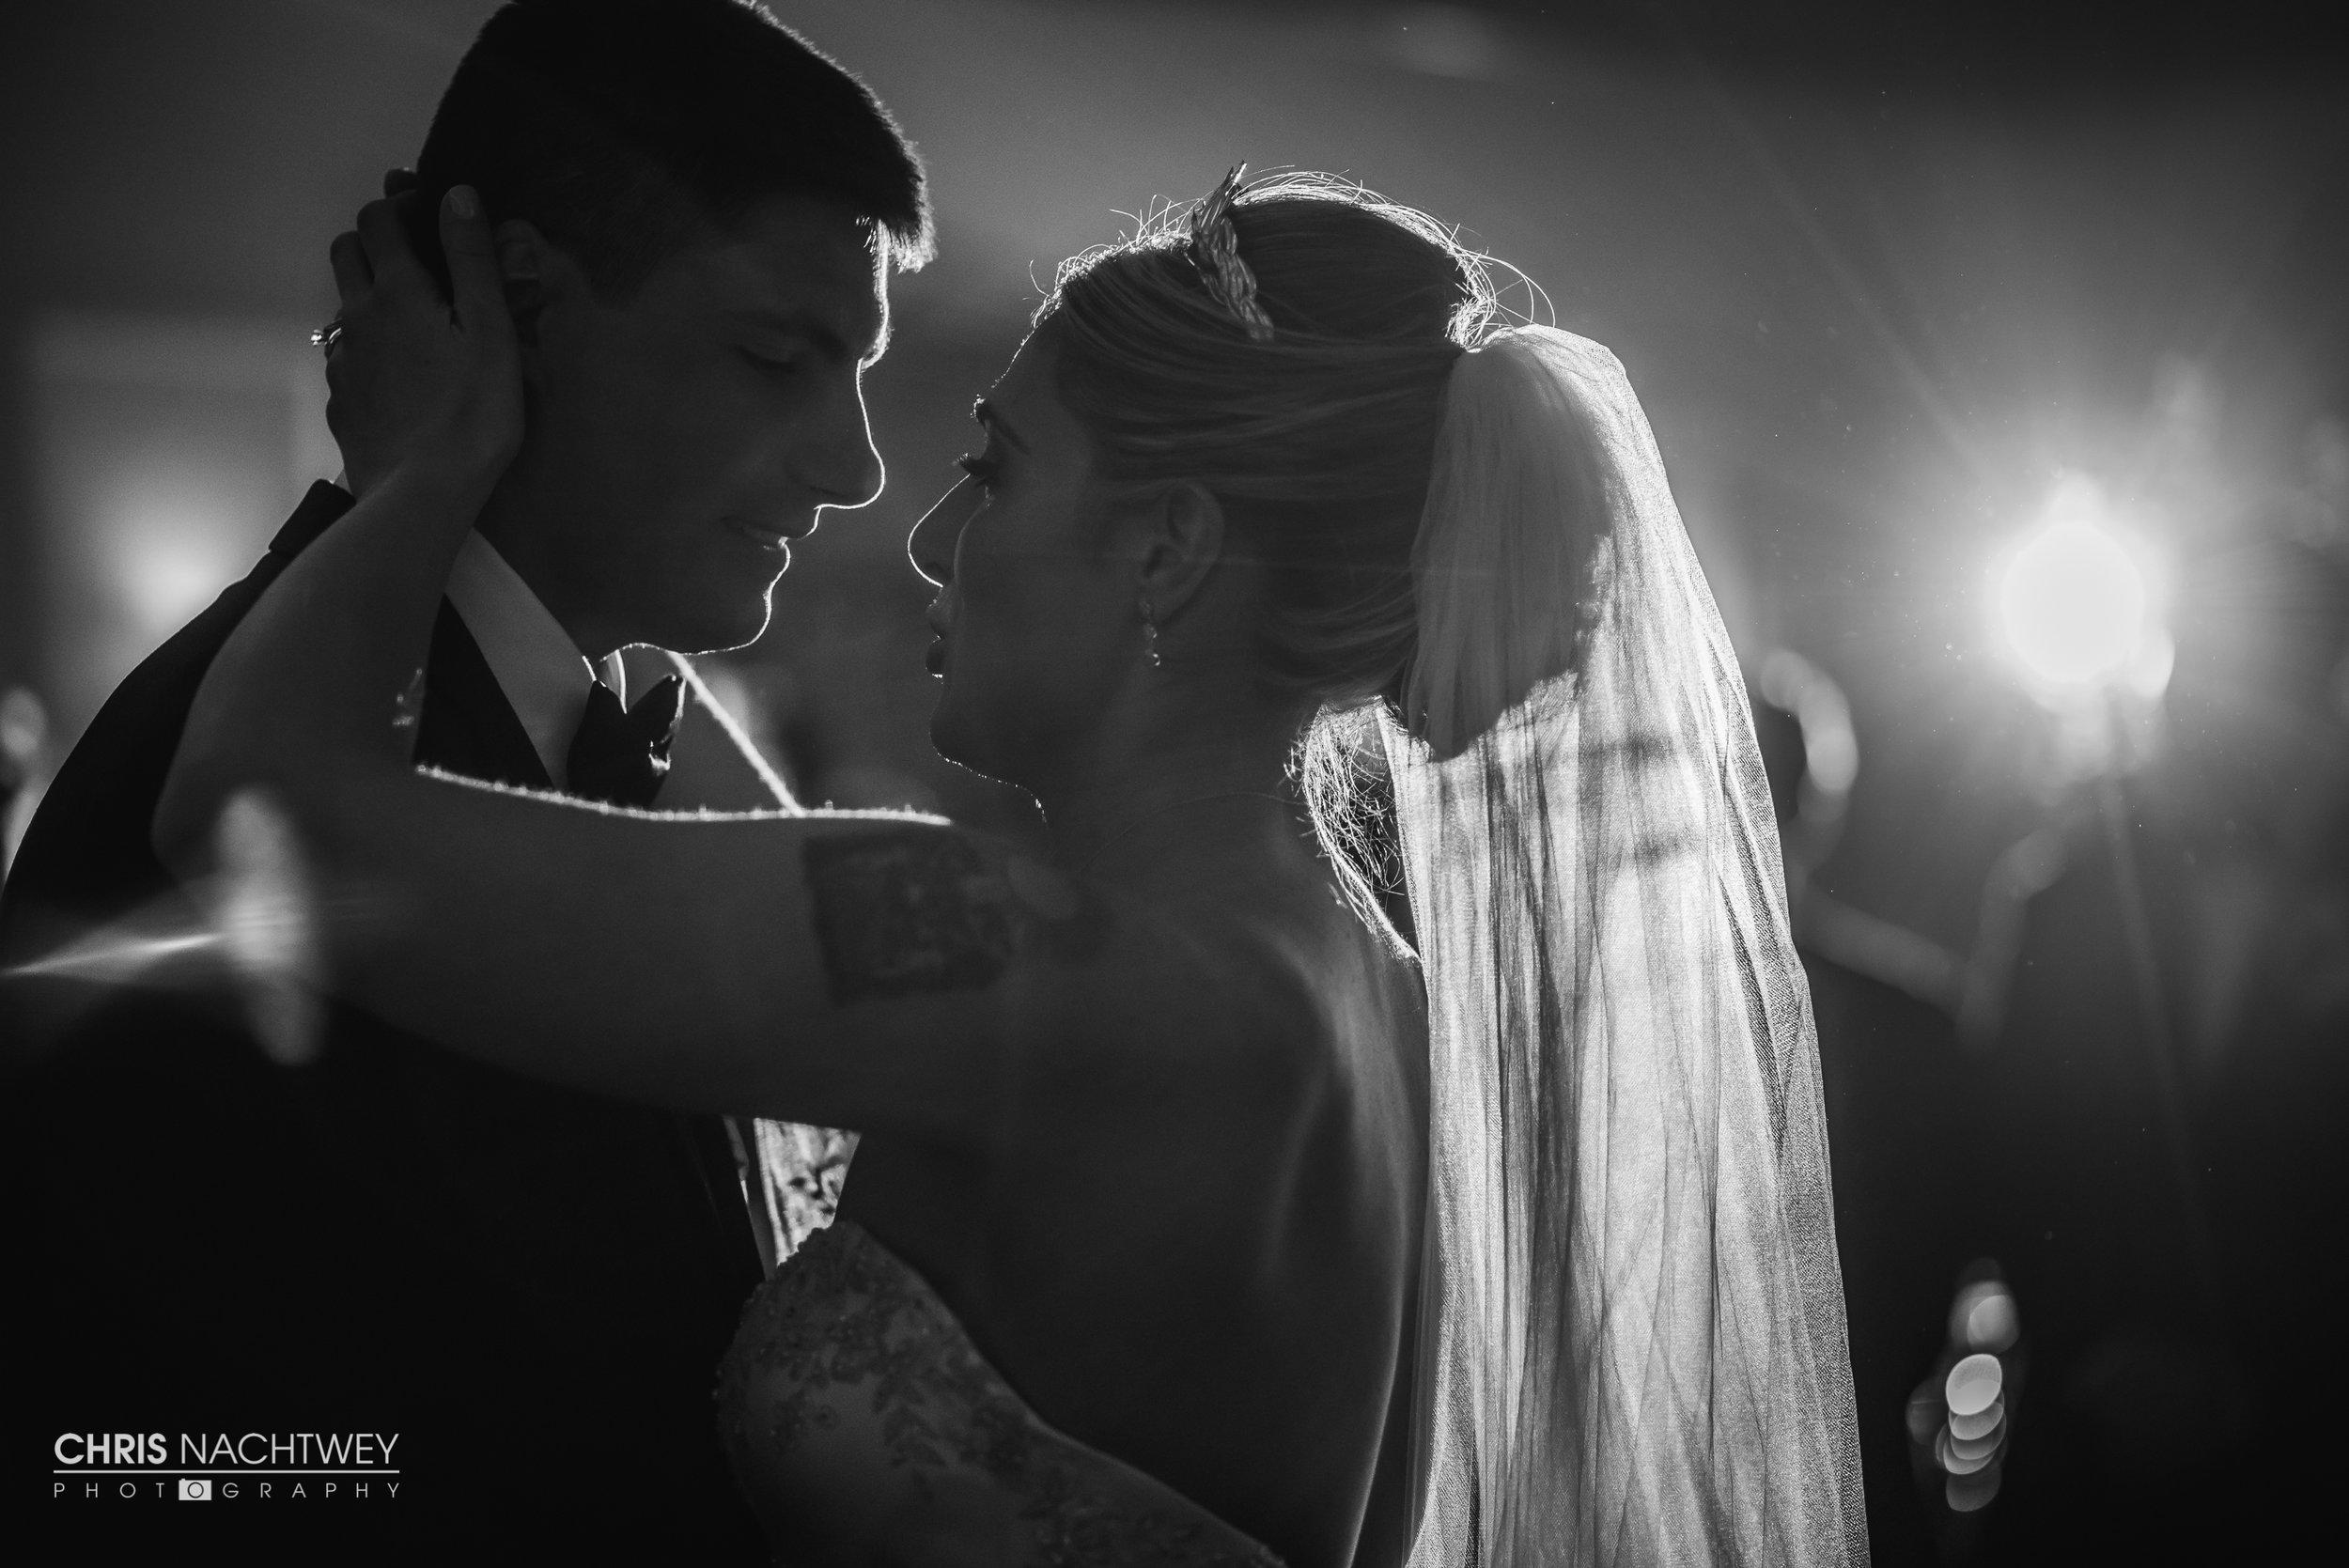 hilton-mystic-wedding-photographer-chris-nachtwey-2017-21.jpg